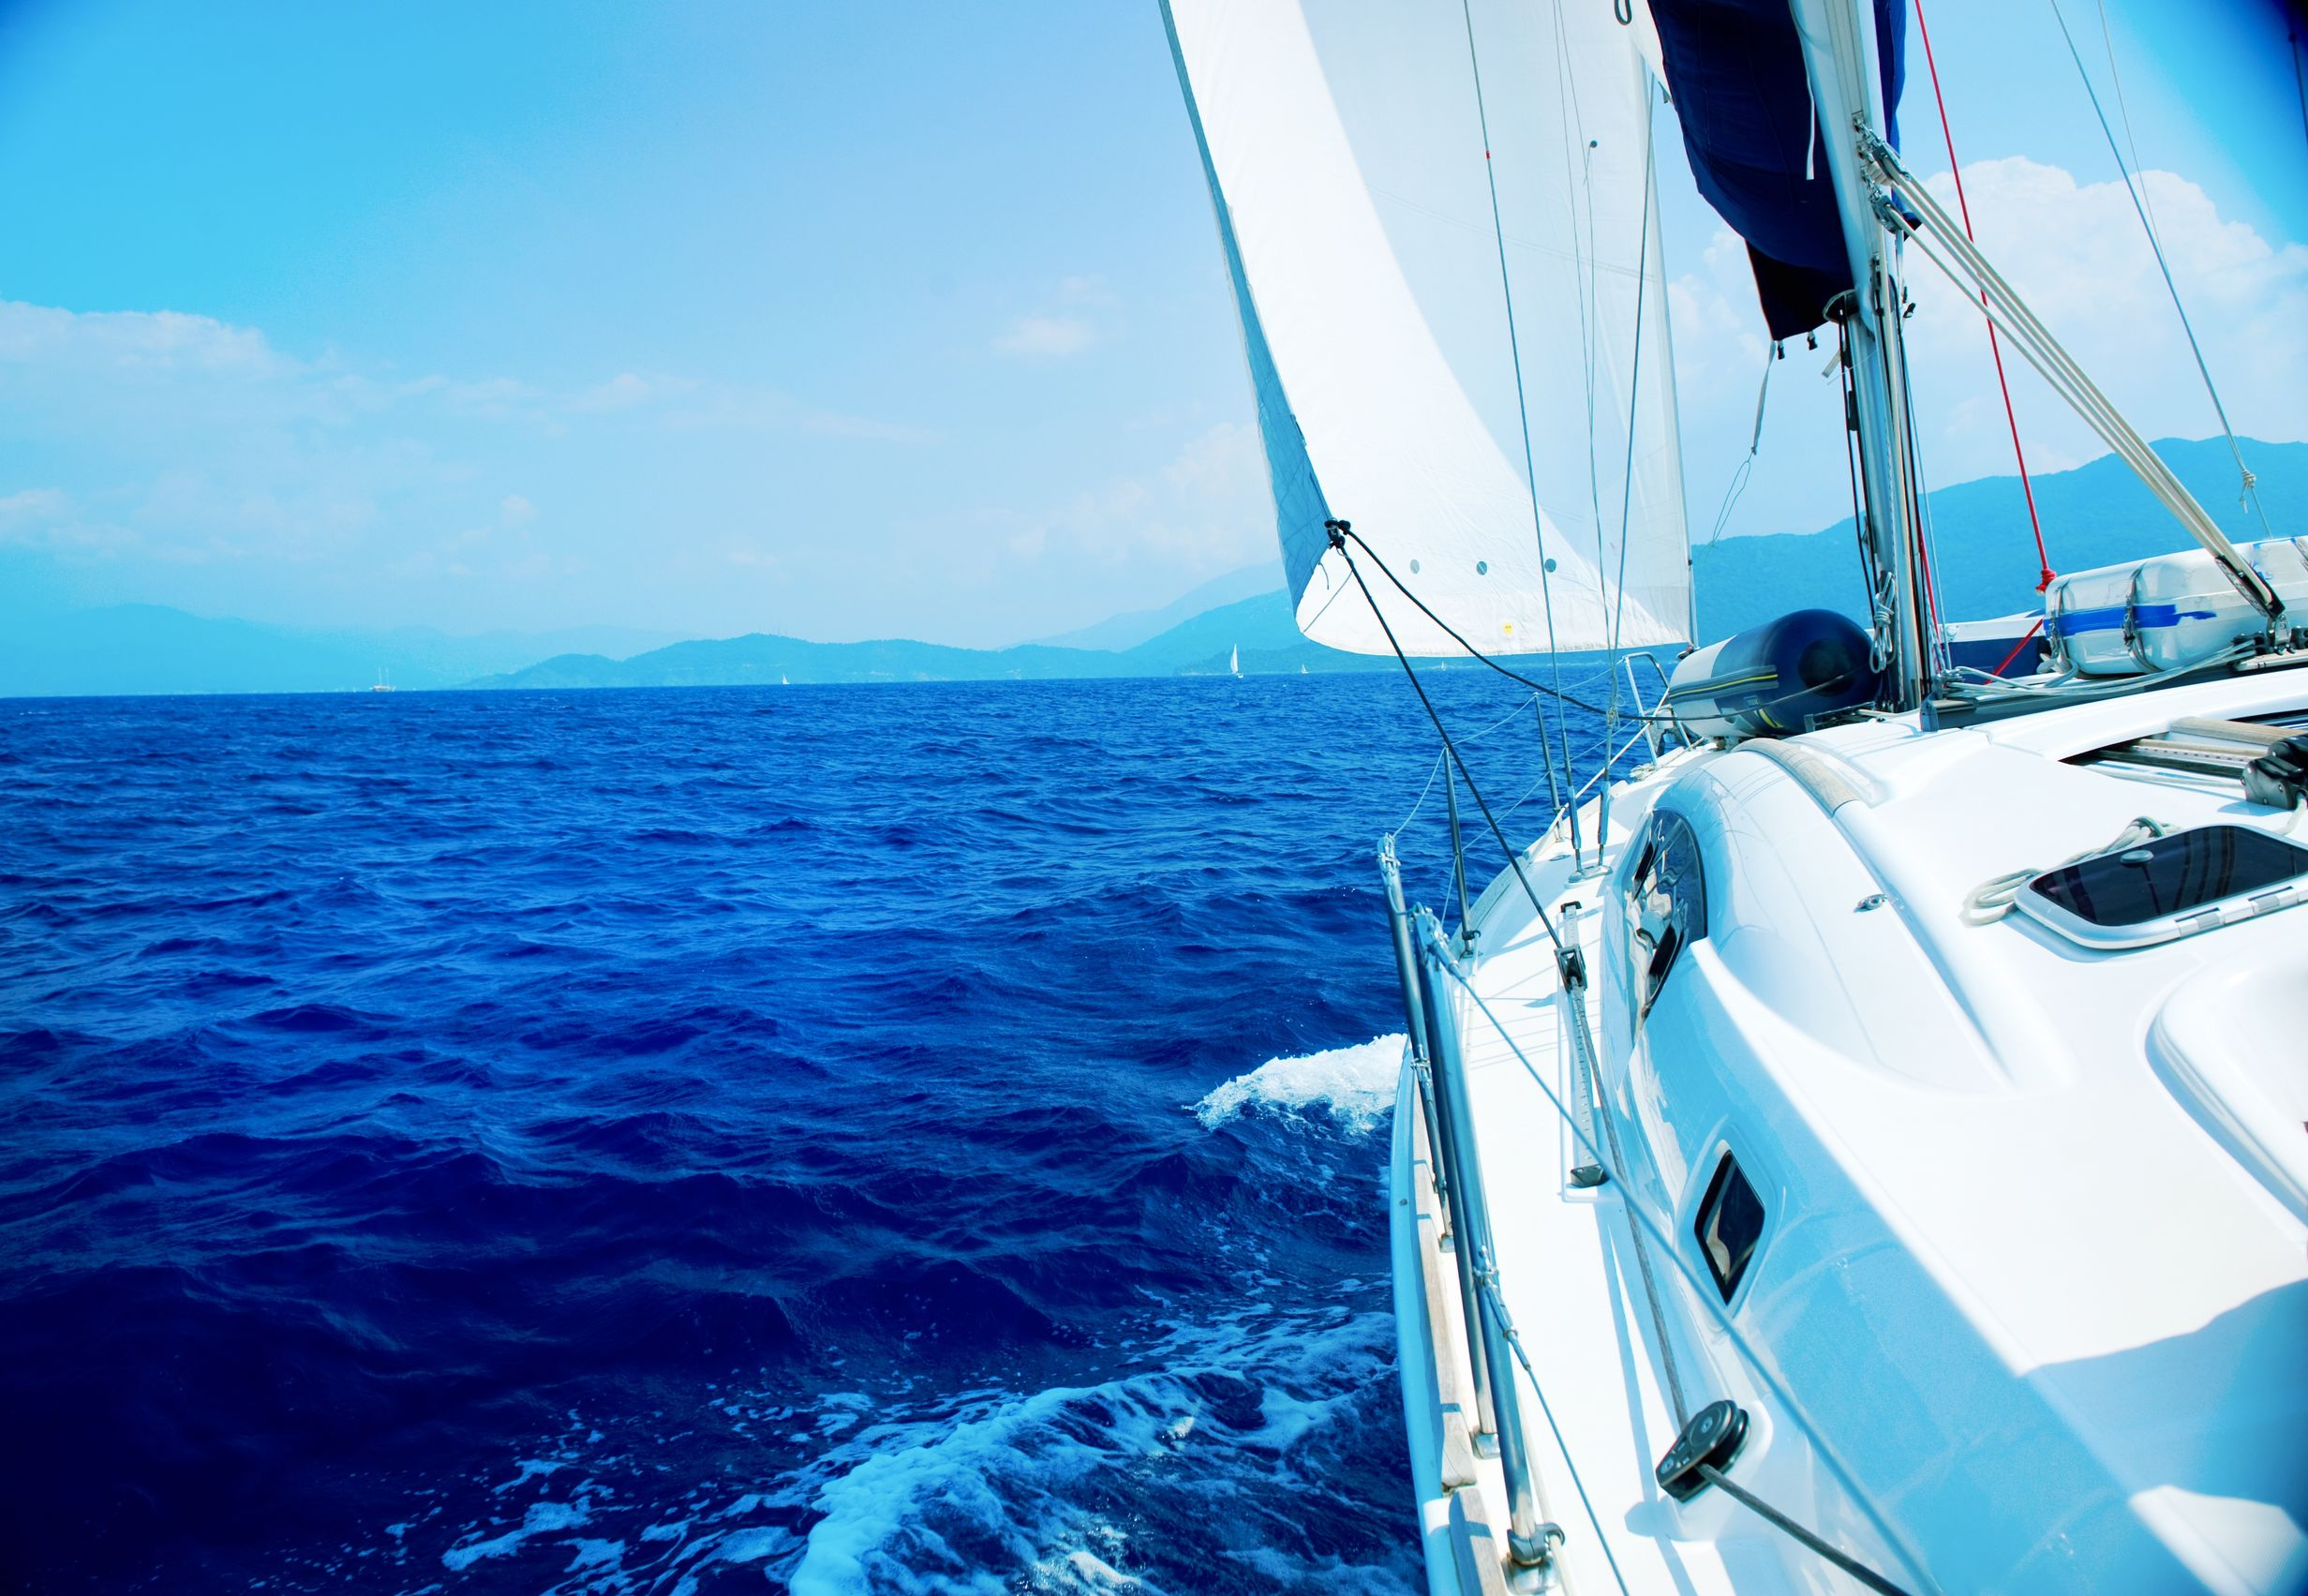 australia ocean yacht 123rf